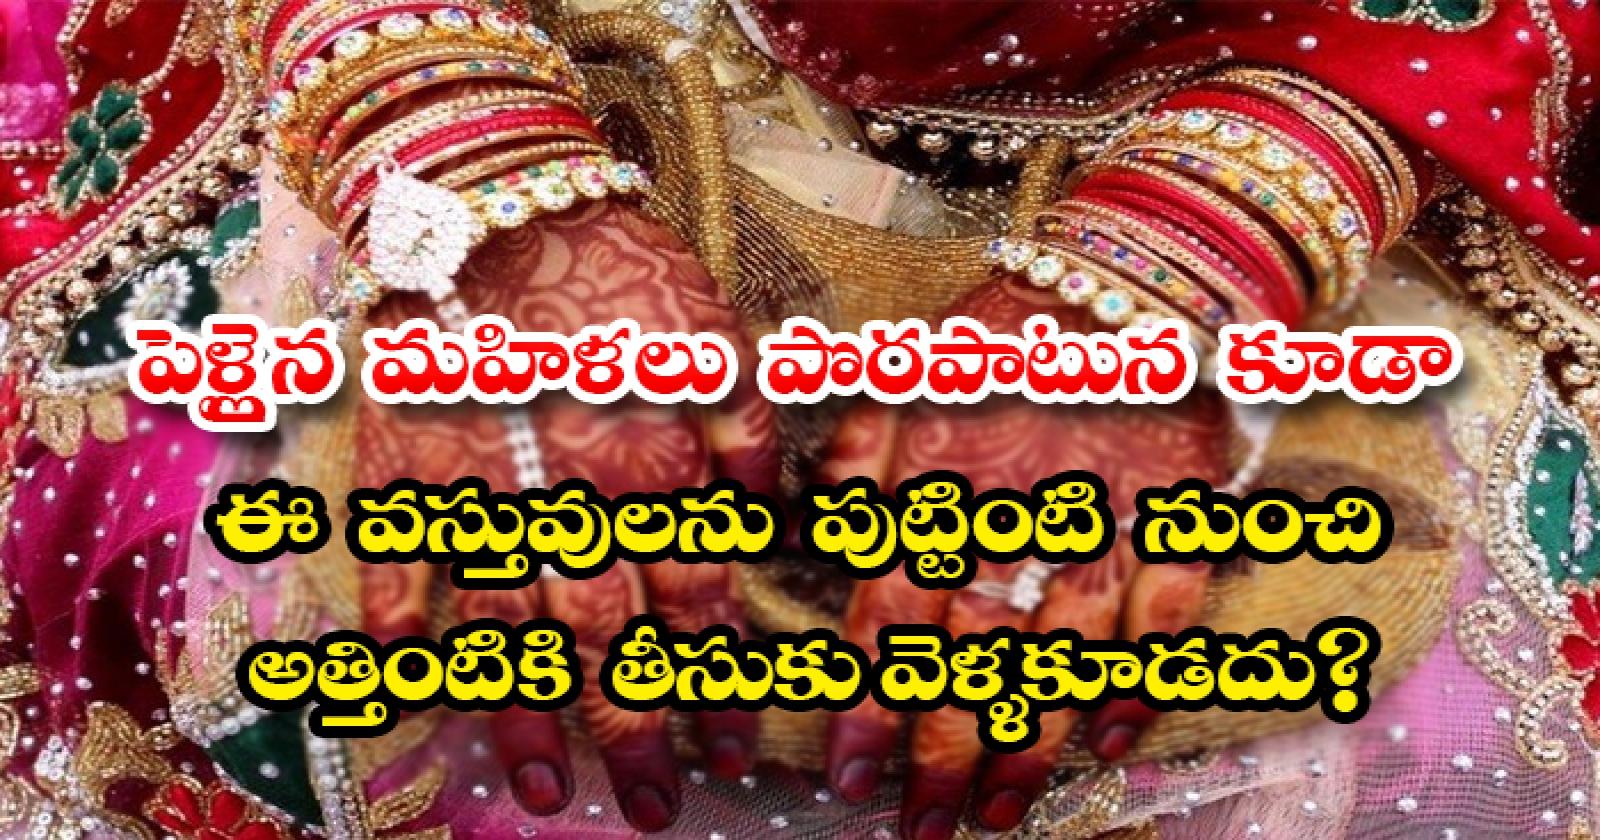 Married Women Should Not Carry These Items To The Fireplace-పెళ్లైన మహిళలు పొరపాటున కూడా ఈ వస్తువులను పుట్టింటి నుంచి అత్తింటికి తీసుకు వెళ్ళకూడదు-Latest News - Telugu-Telugu Tollywood Photo Image-TeluguStop.com